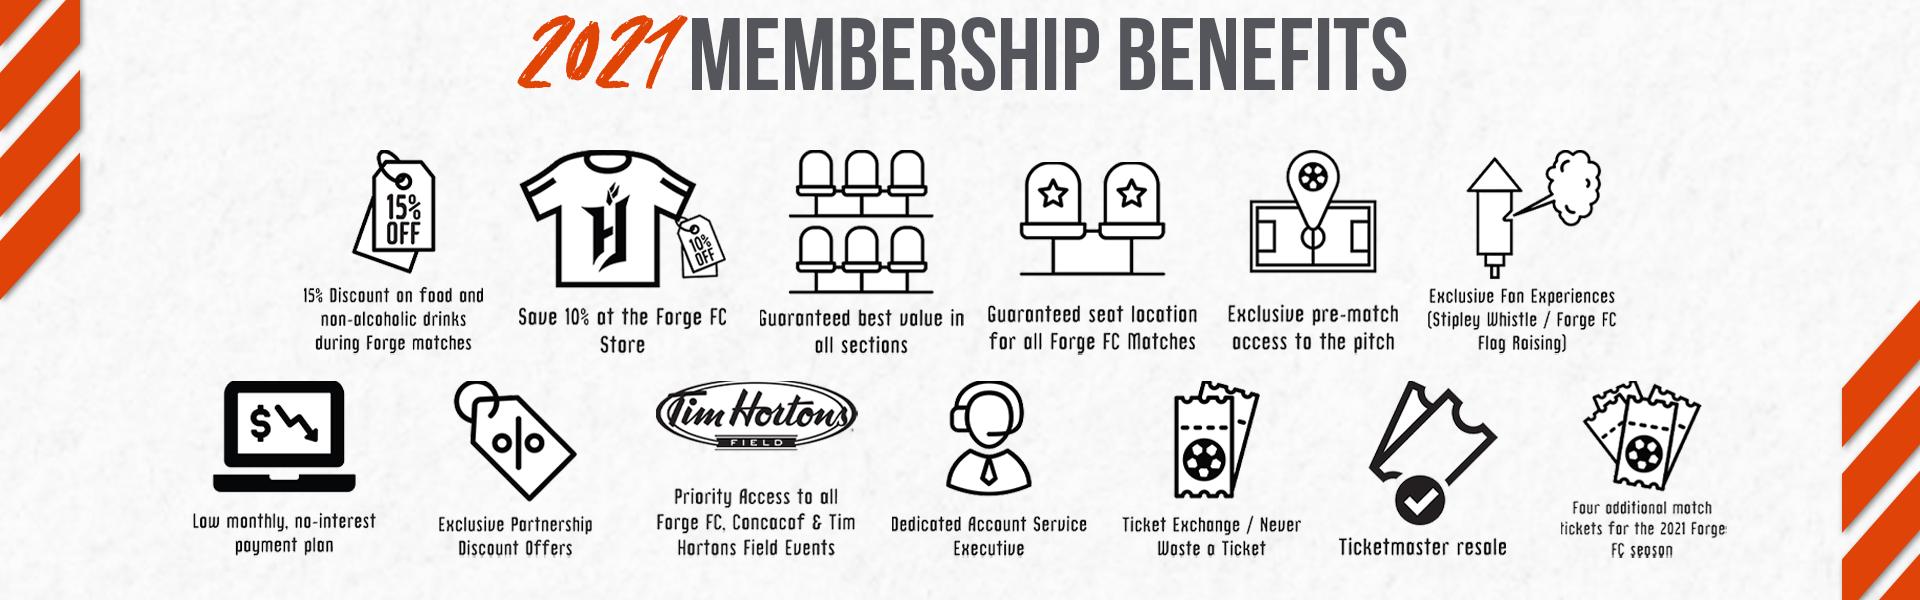 2021-Membership-Benefits-1920x600